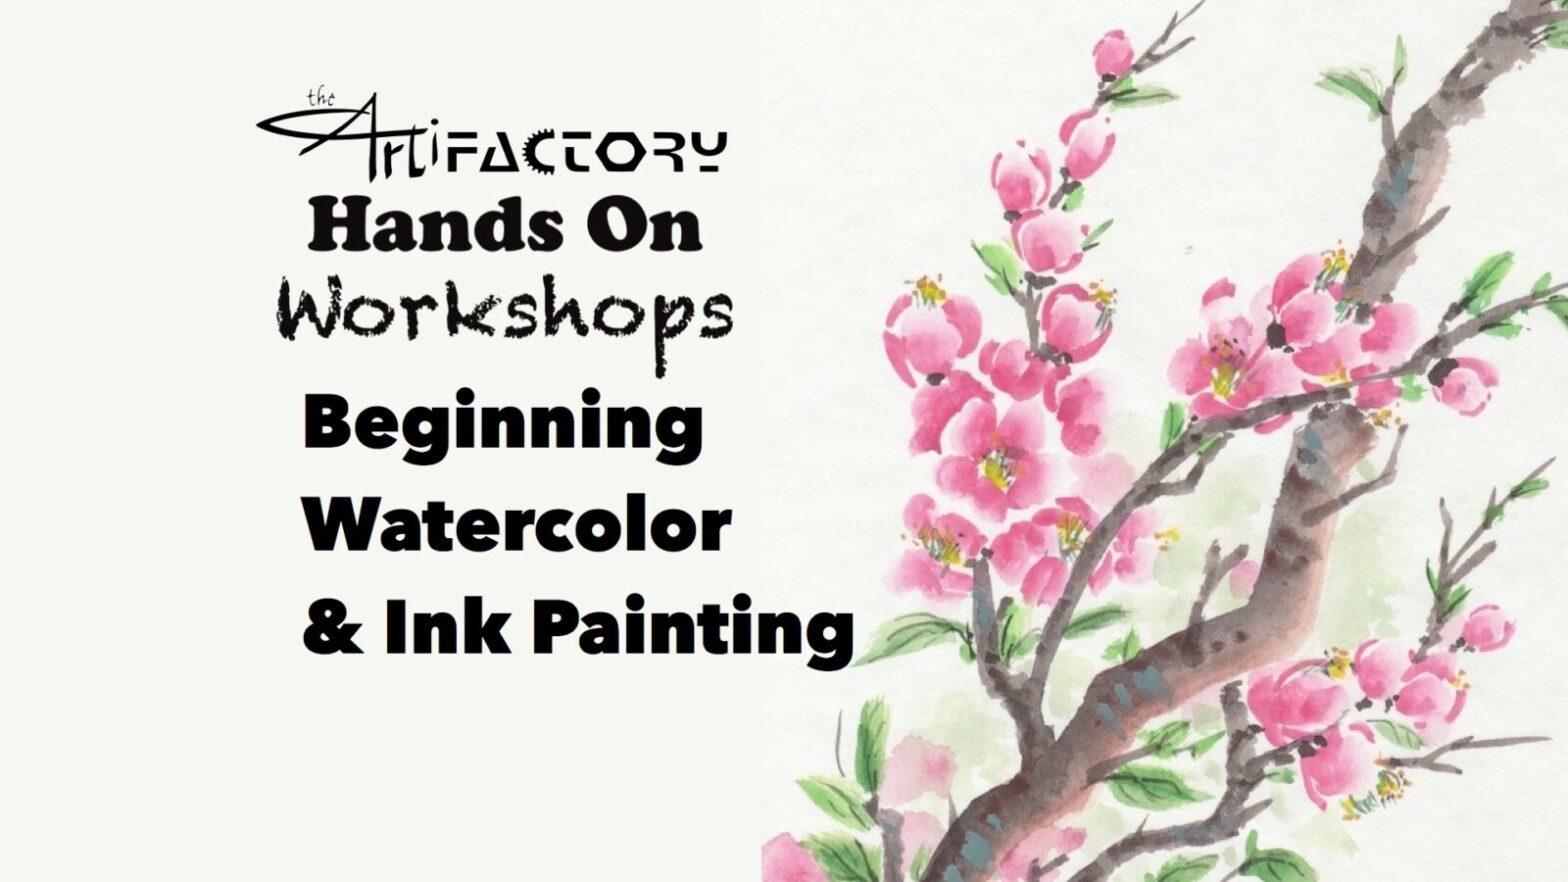 Beginning Watercolor & Ink Painting